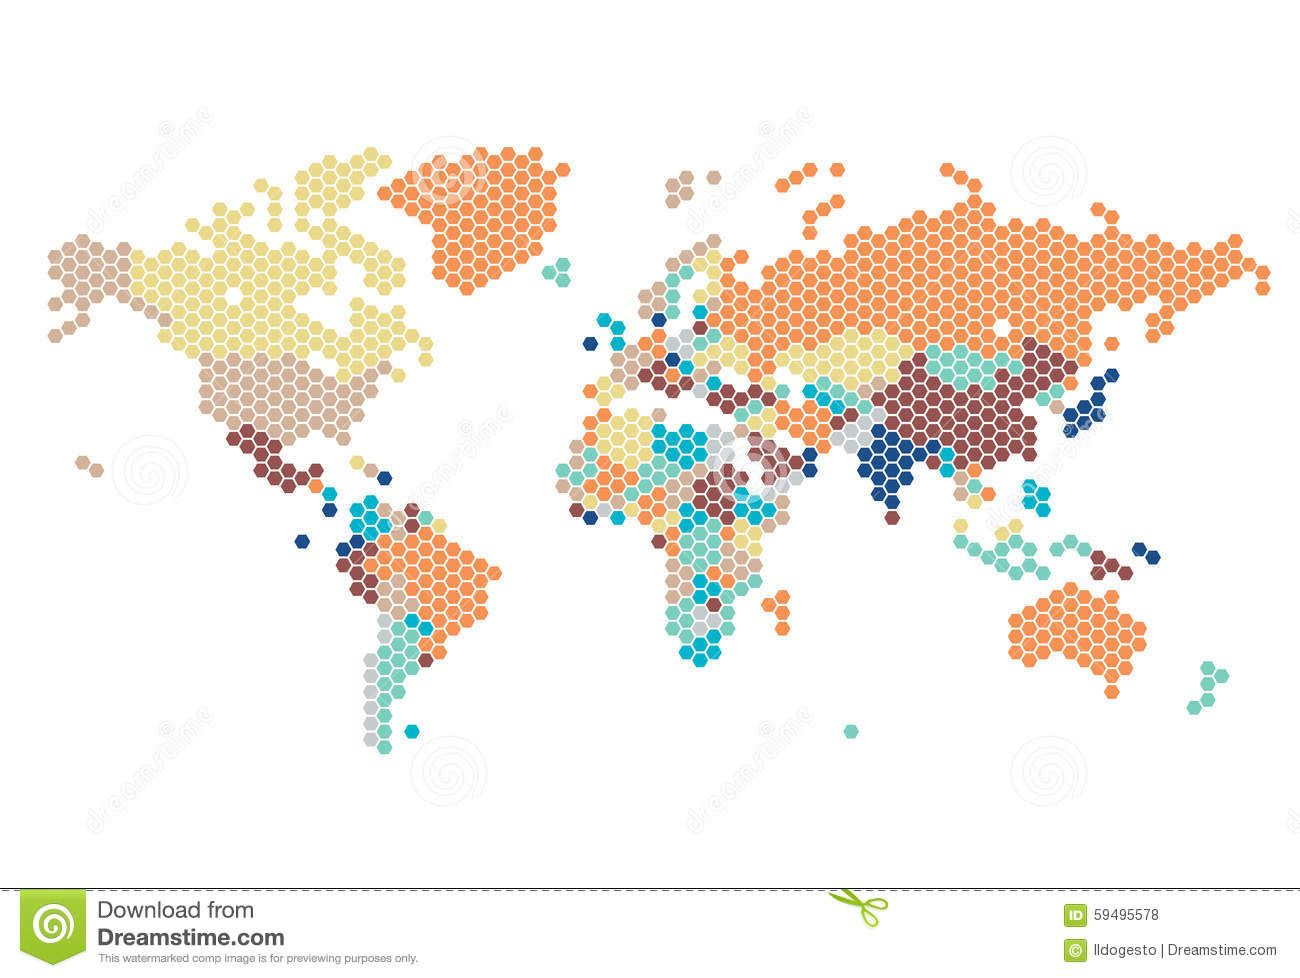 Dotted world map hexagonal dots white background vector illustration dotted world map hexagonal dots white background vector gumiabroncs Image collections